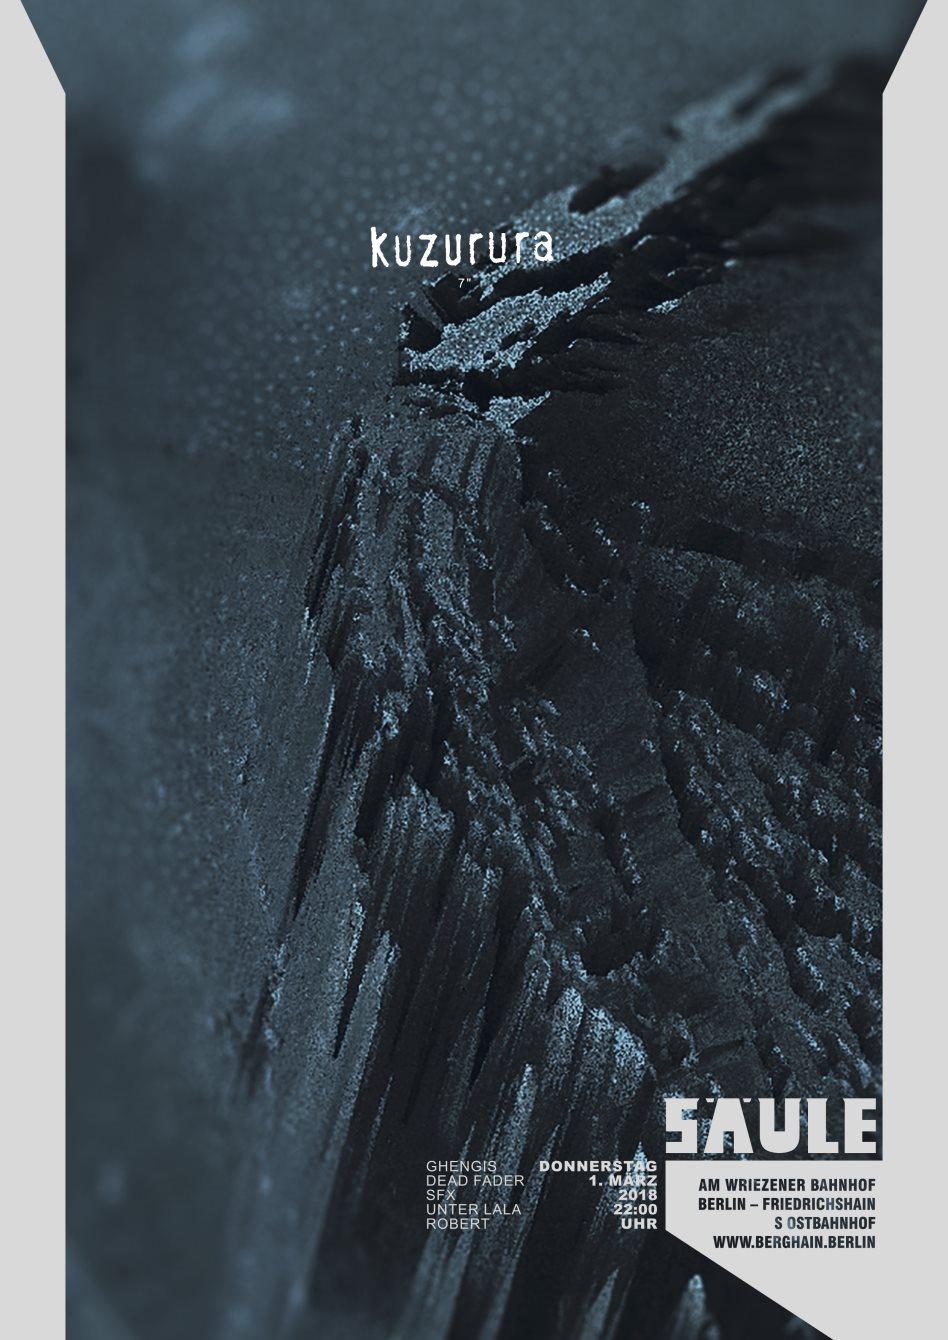 Kuzurura - Flyer back